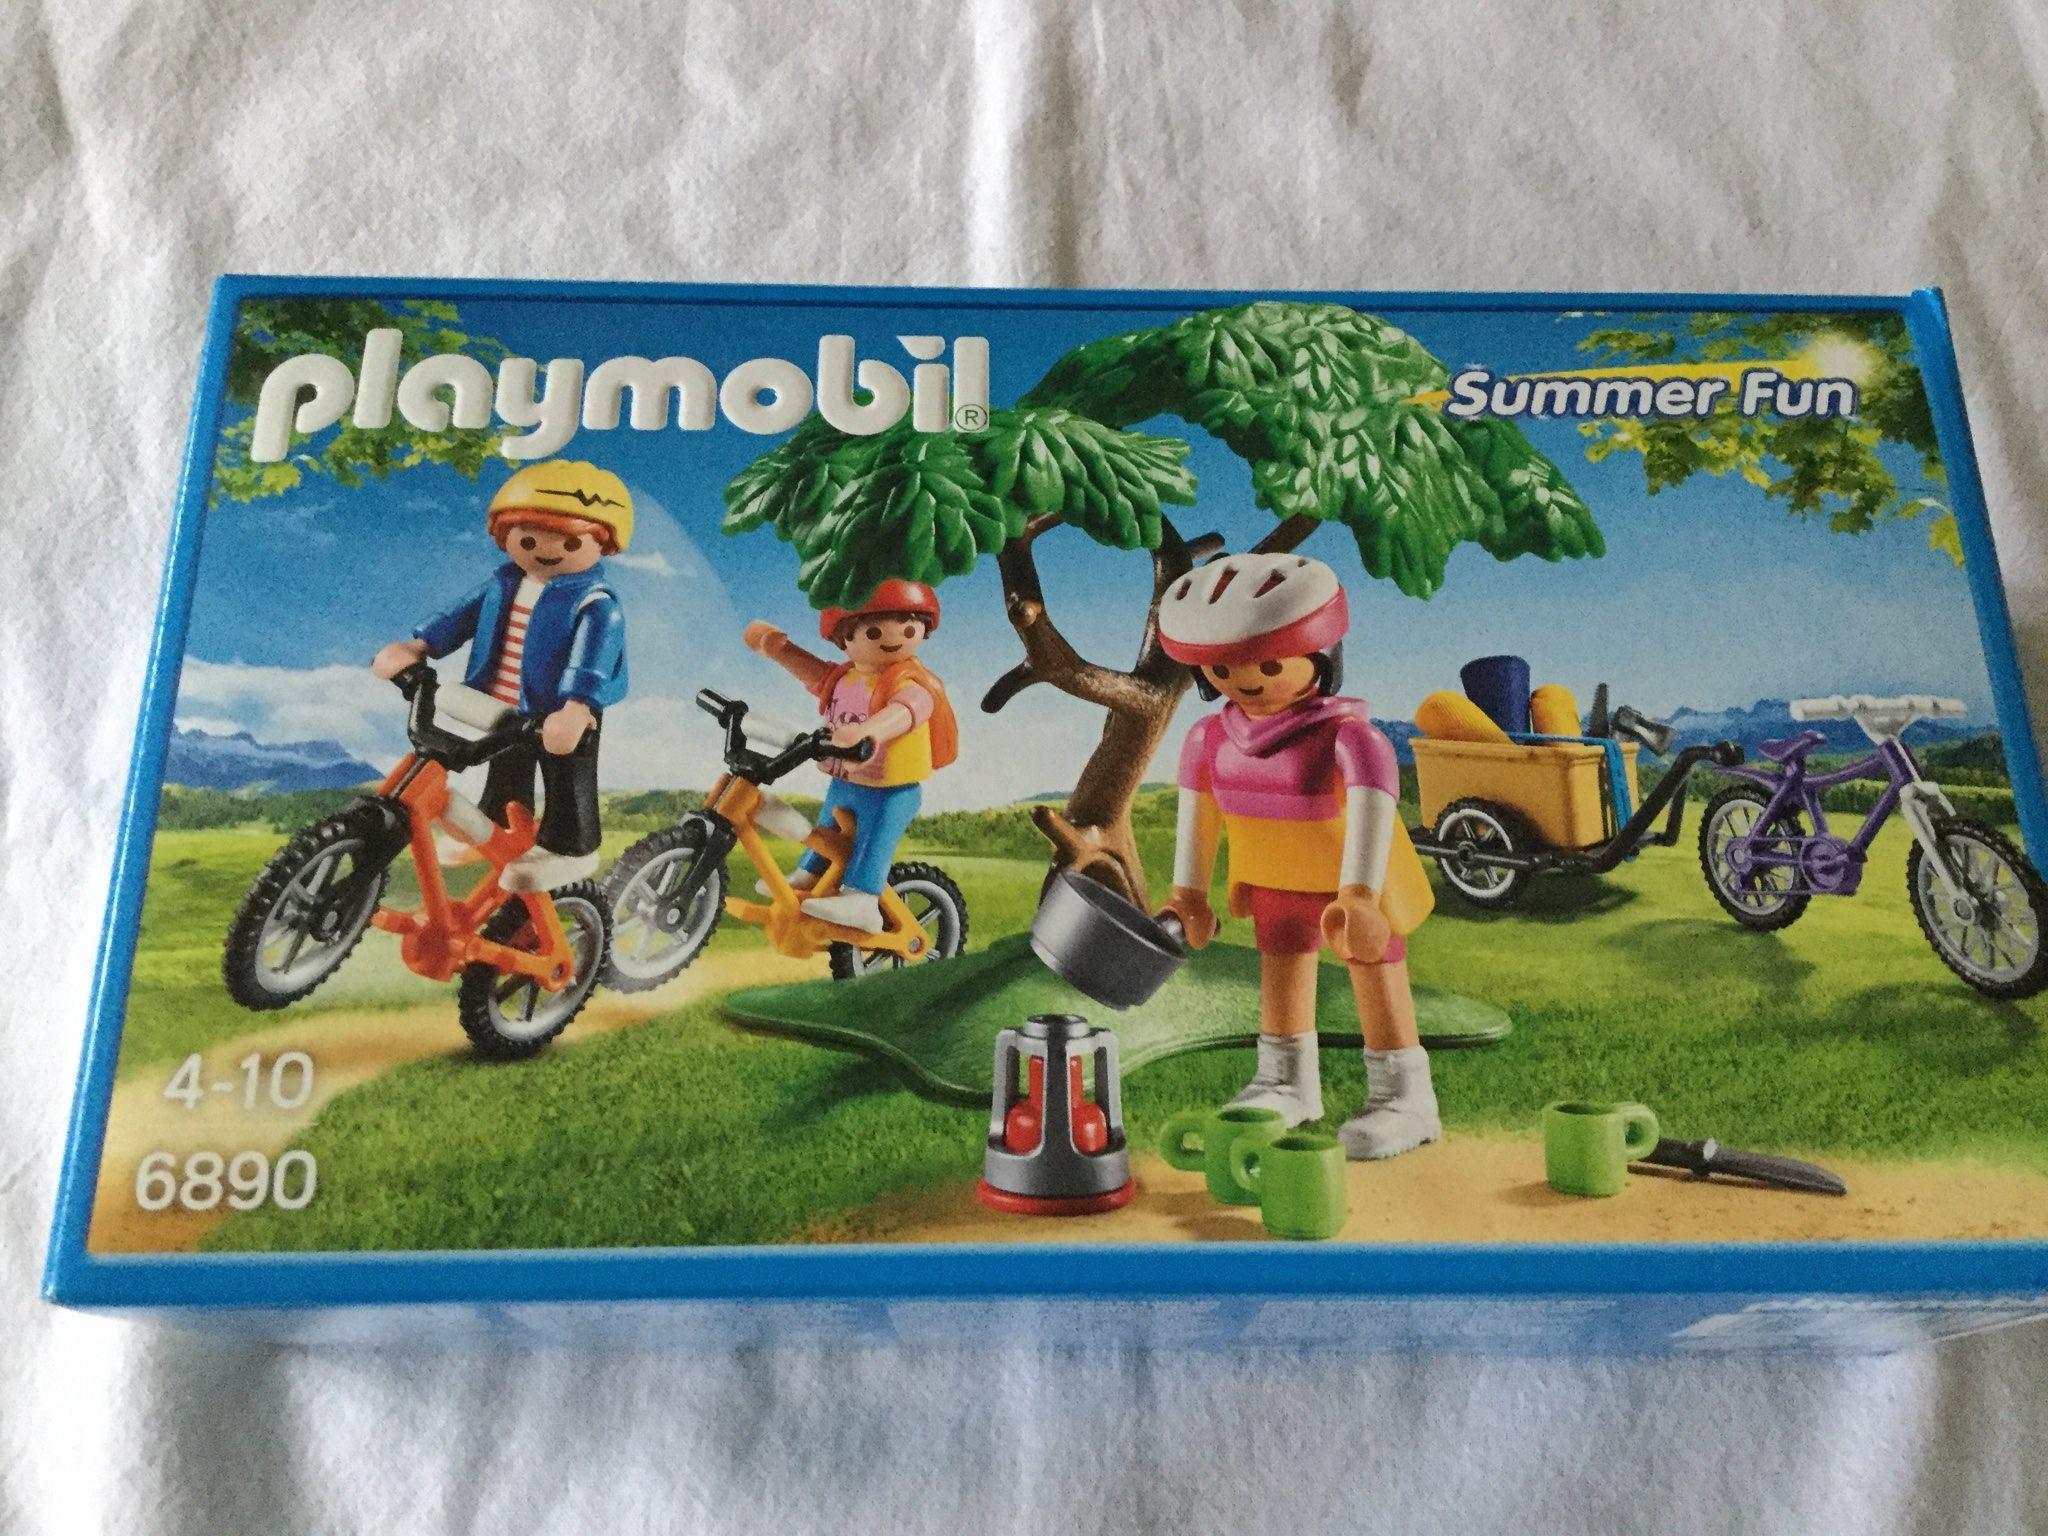 NYTT - Playmobil - Mountainbiketur med vagn 6890